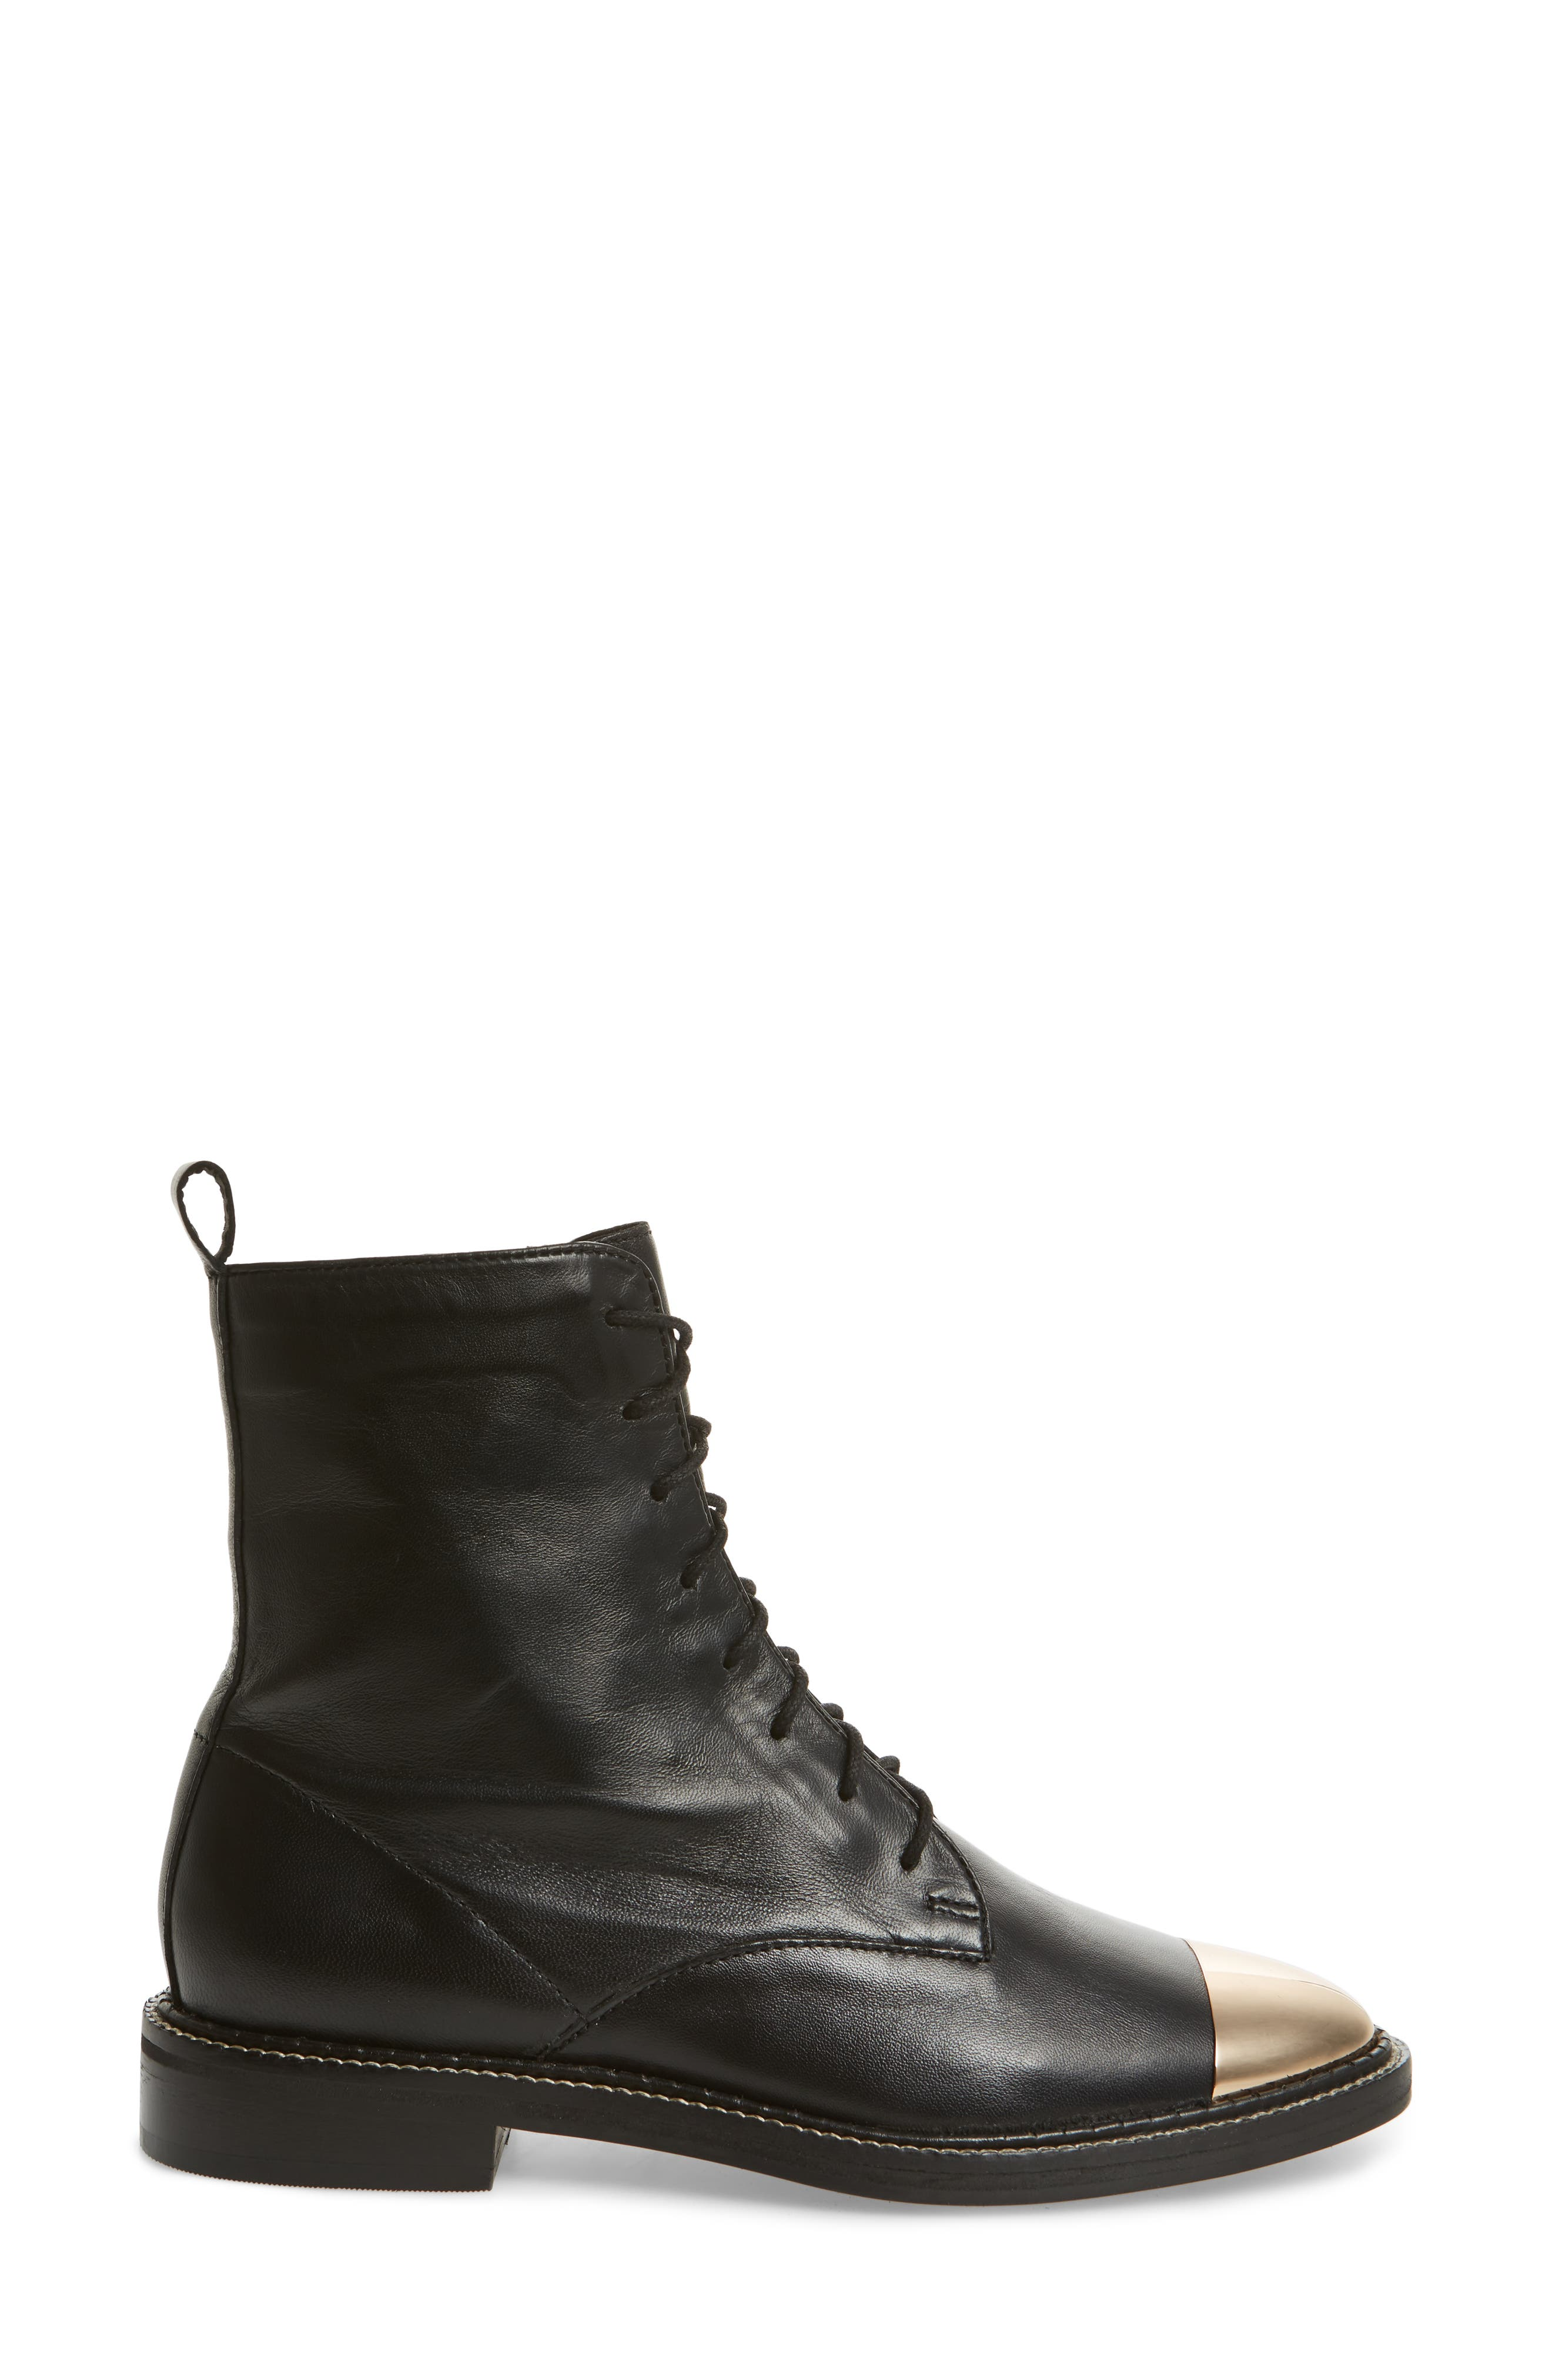 Axel Cap Toe Boot,                             Alternate thumbnail 3, color,                             001